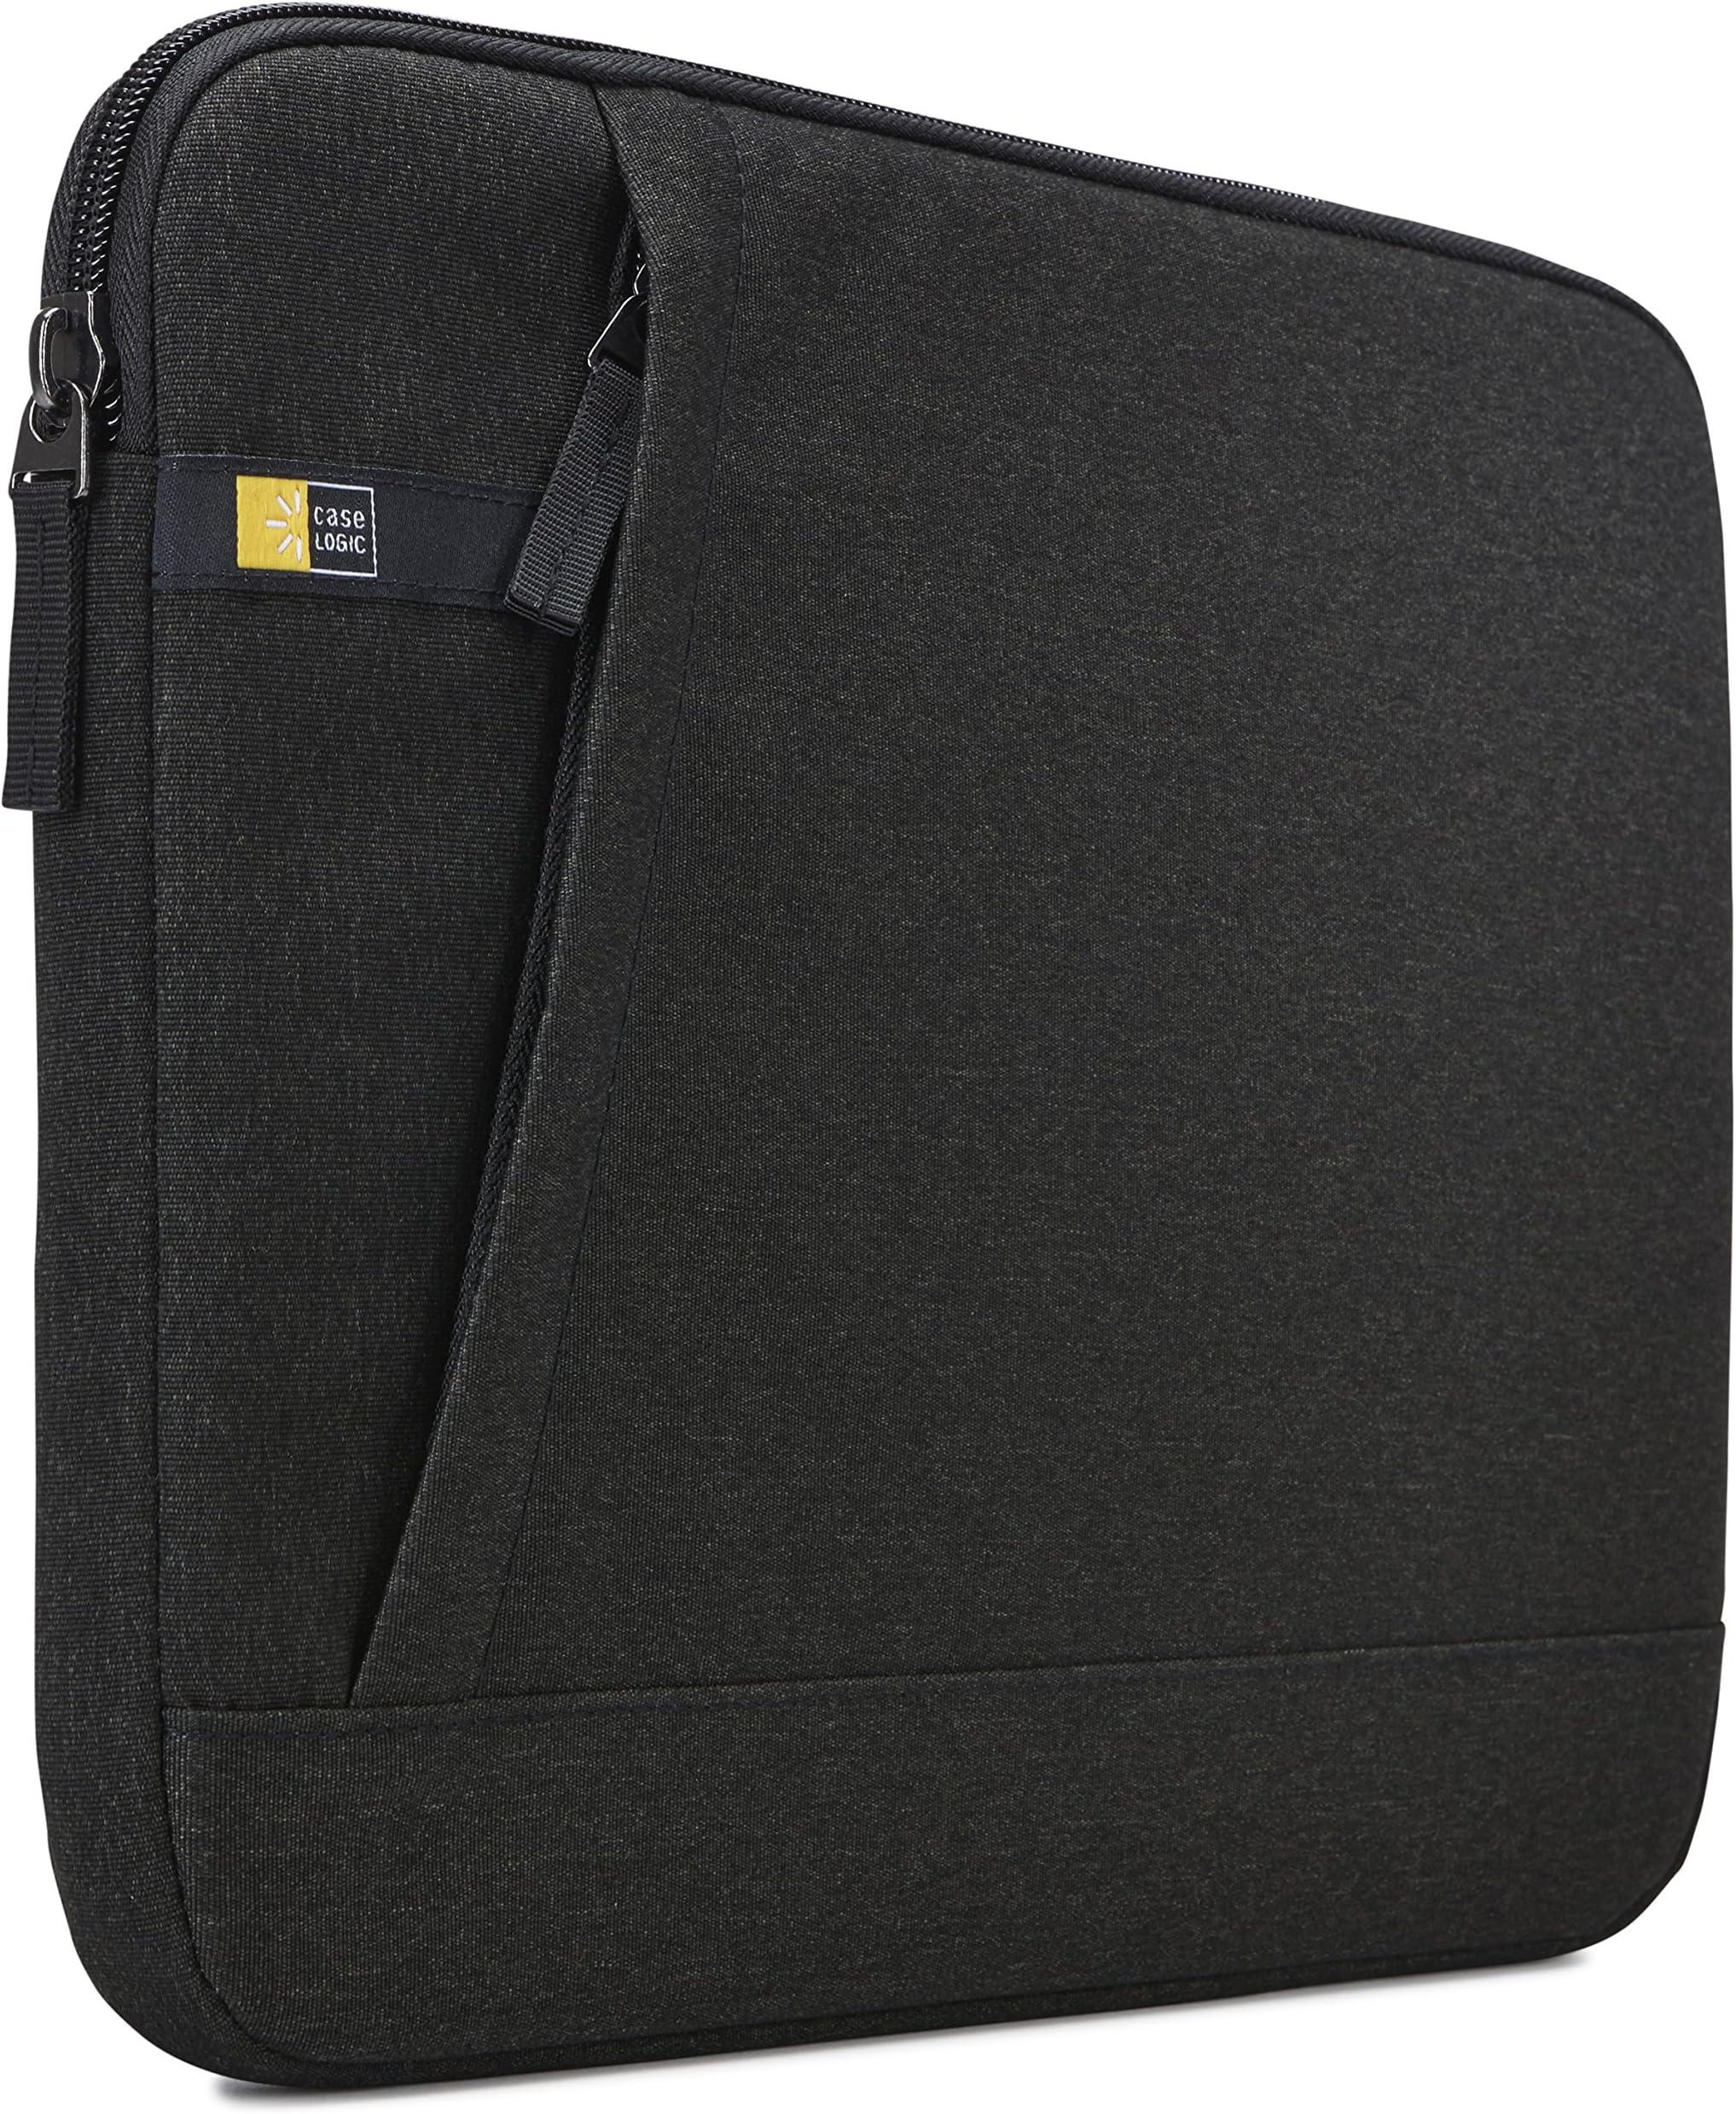 Case Logic Huxton13.3 Laptop Sleeve (HUXS-113BLK),Black